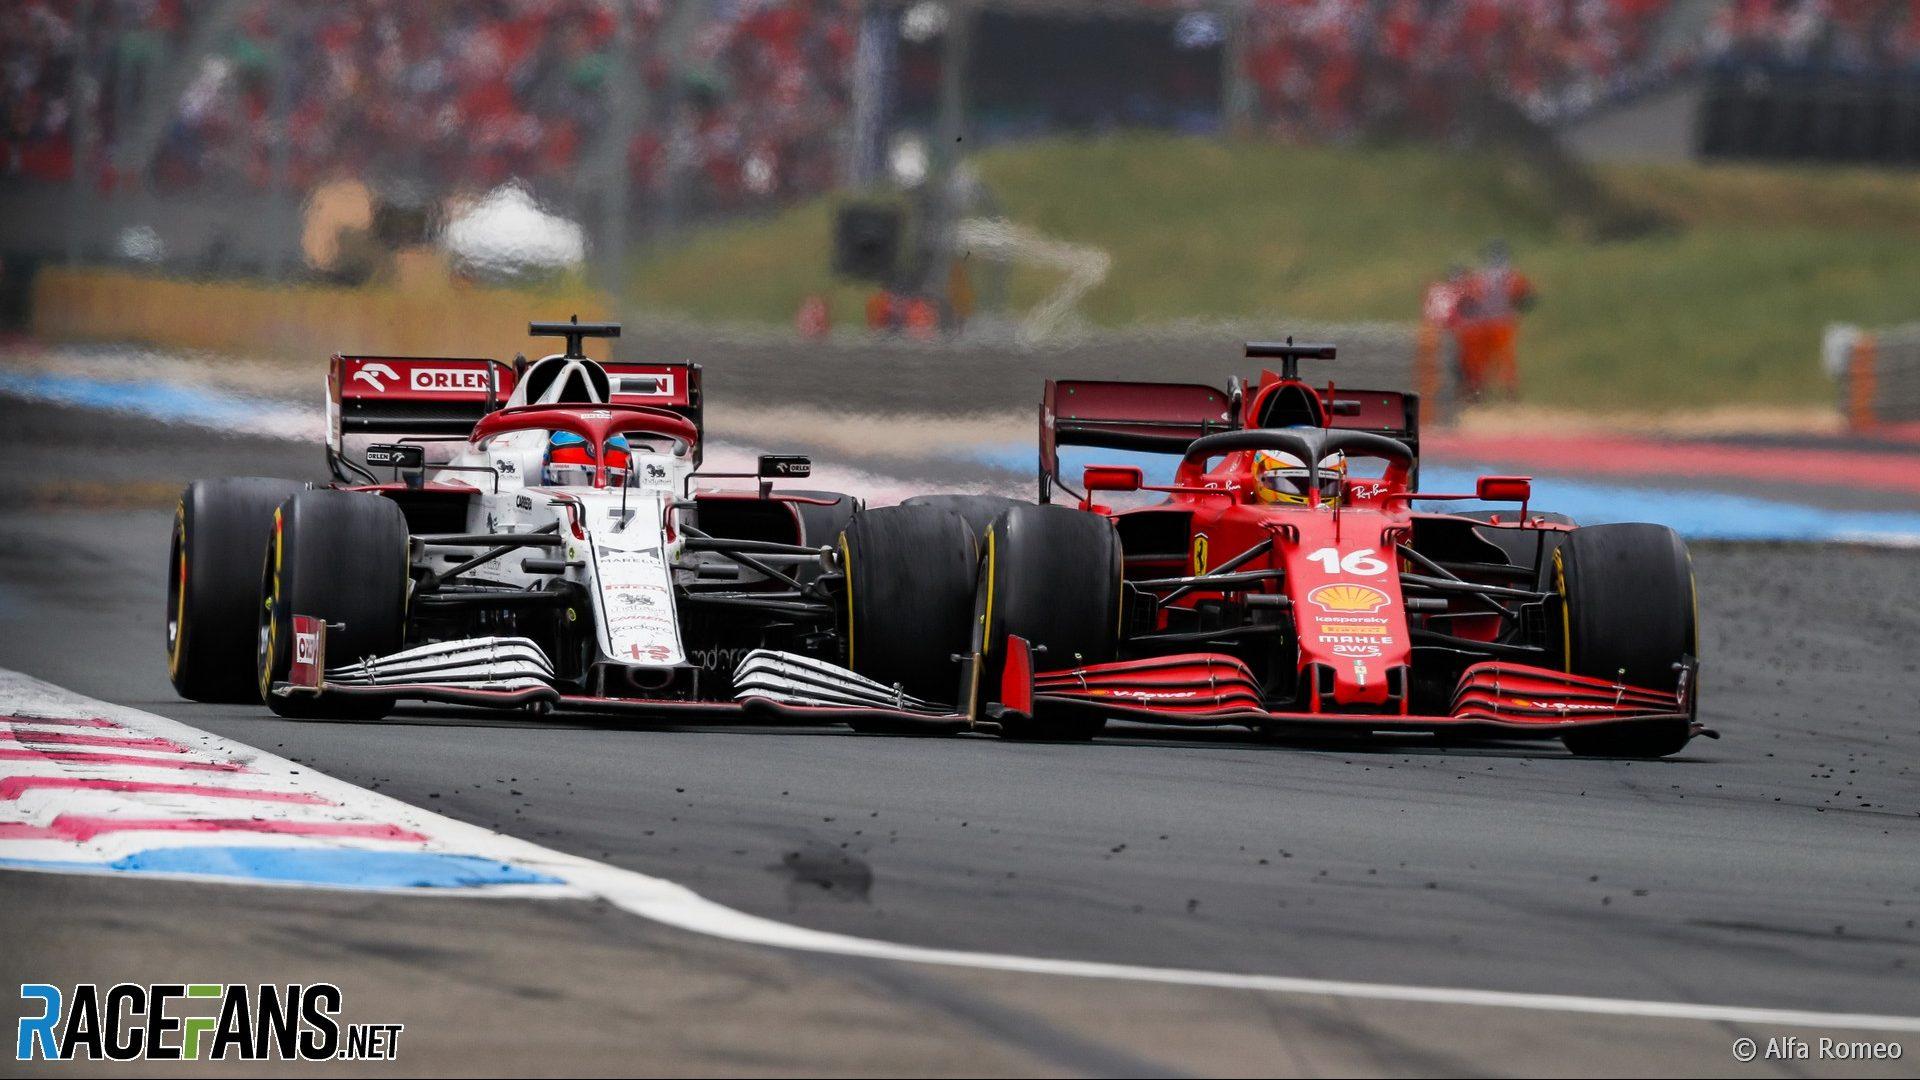 Kimi Raikkonen, Charles Leclerc, Paul Ricard, 2021